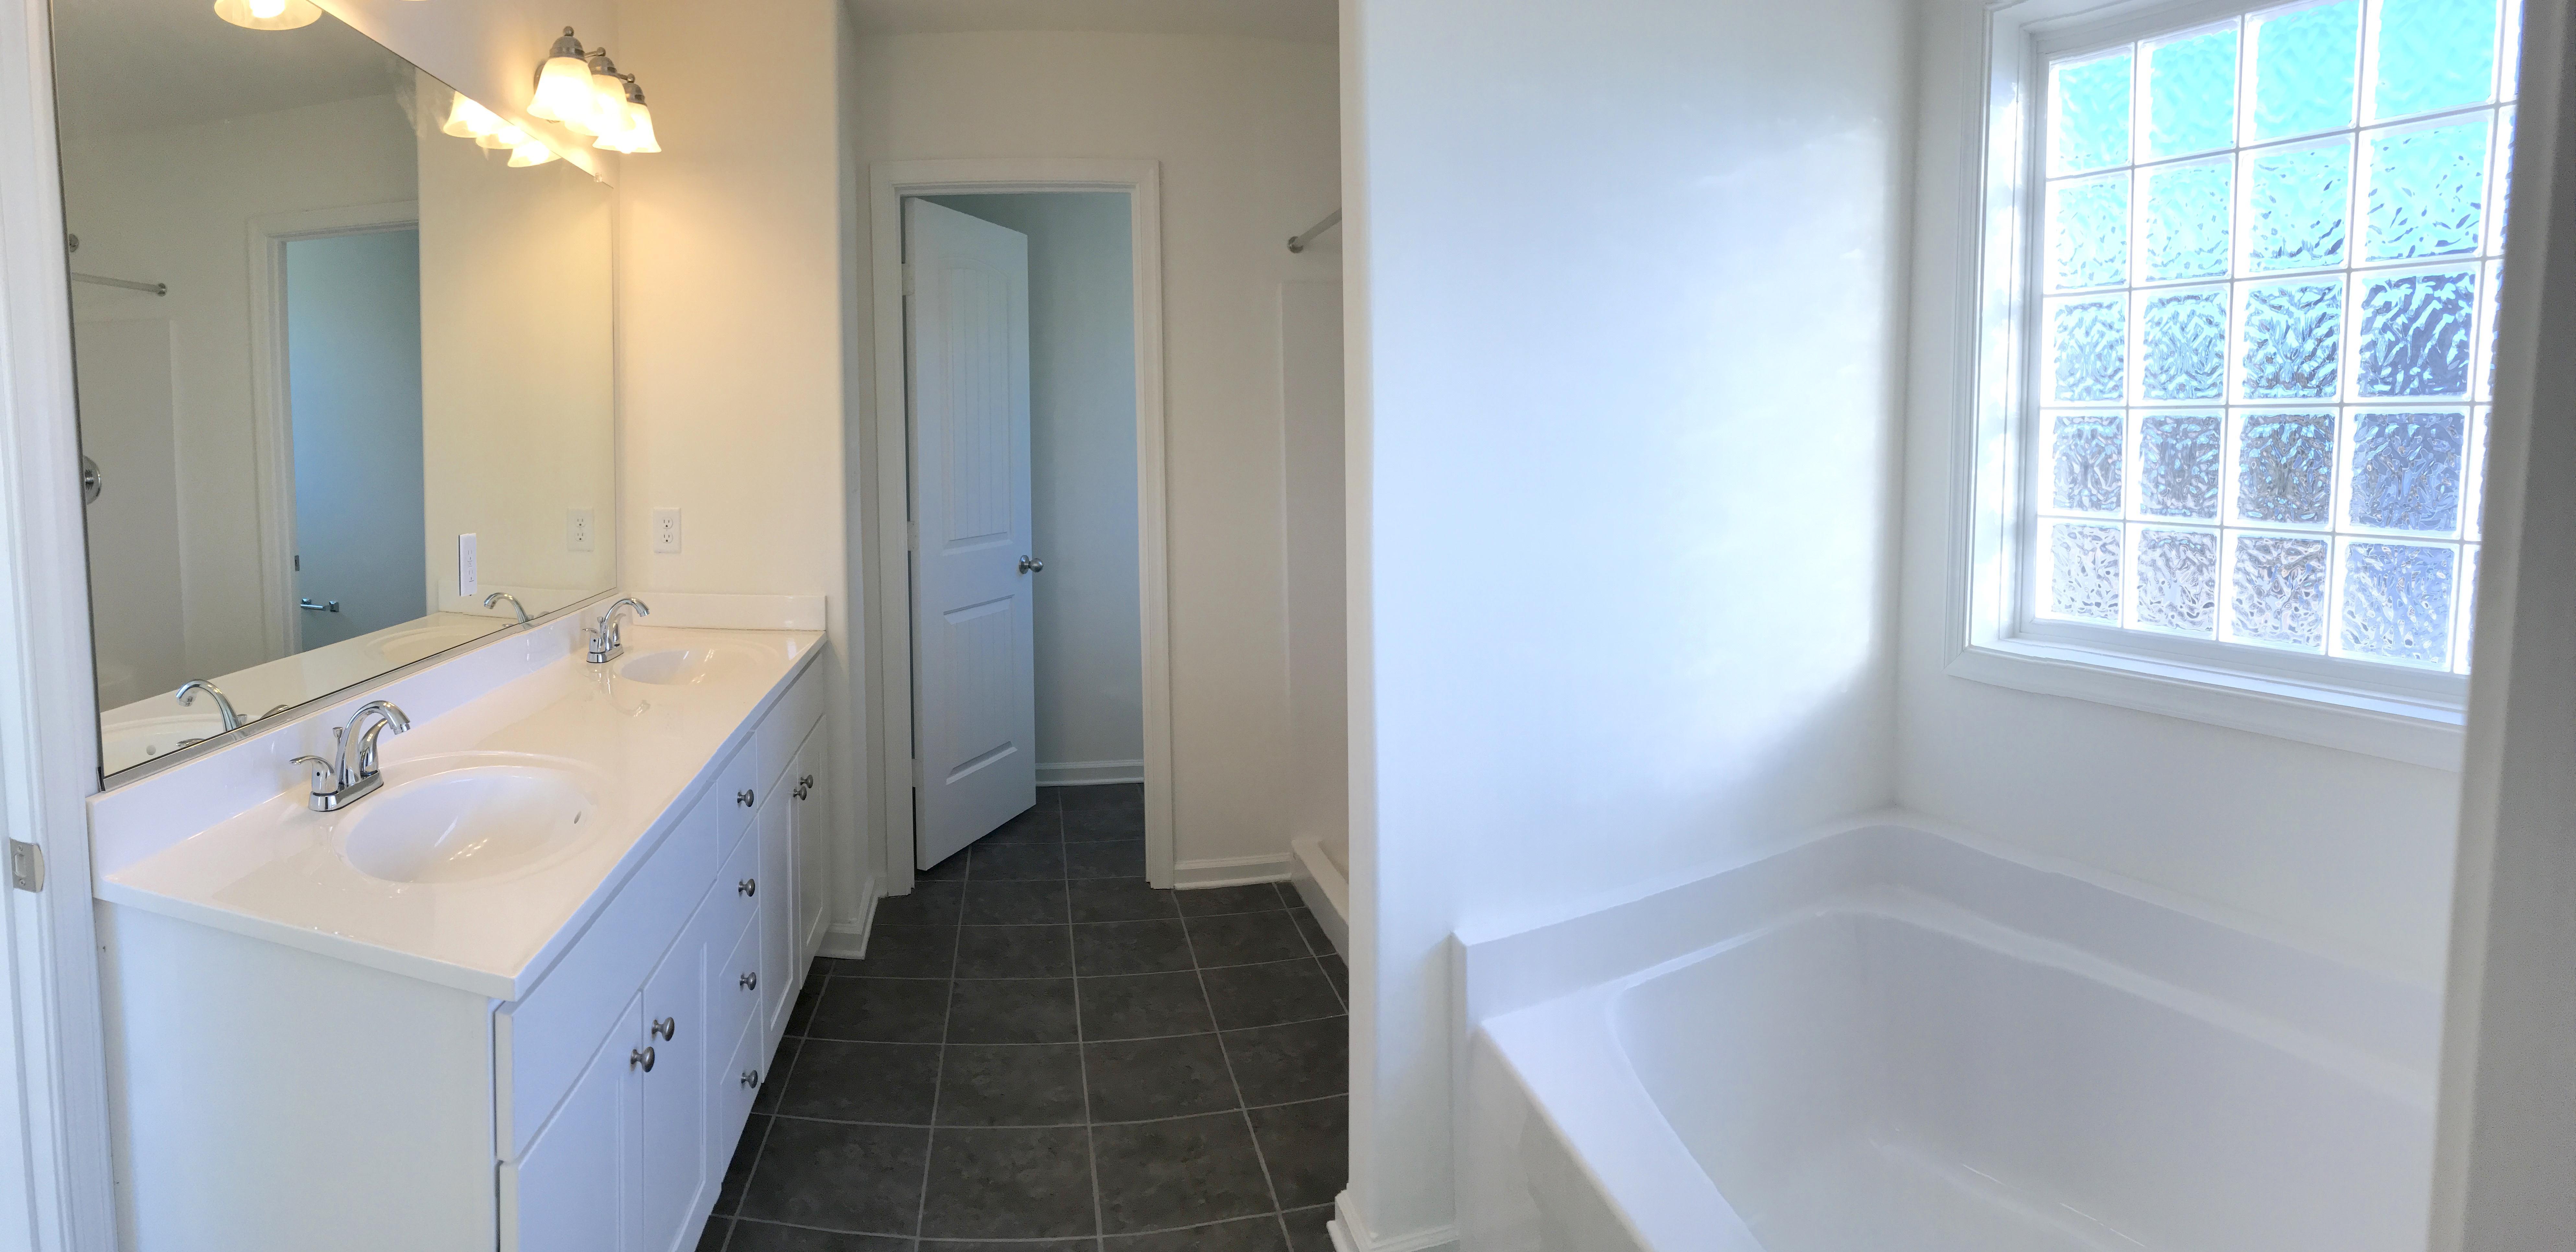 Bathroom featured in The Elmsted 5 Bedroom By Boyd Homes in Richmond-Petersburg, VA